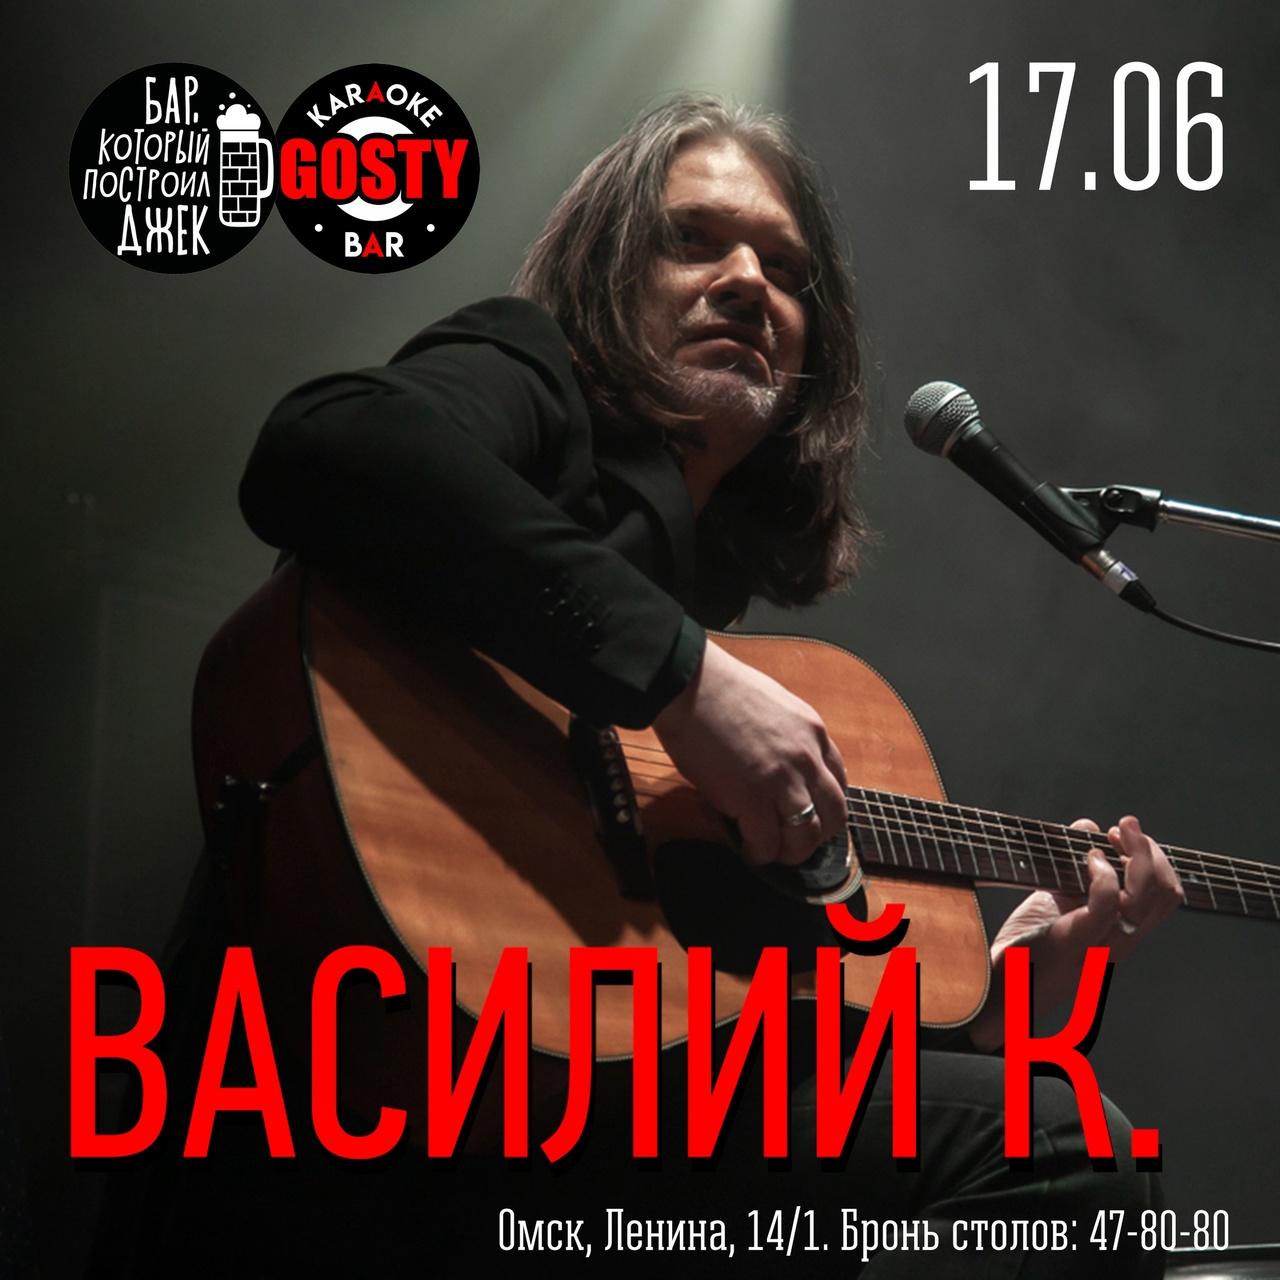 Афиша Омск Василий К. / 17.06 / Омск